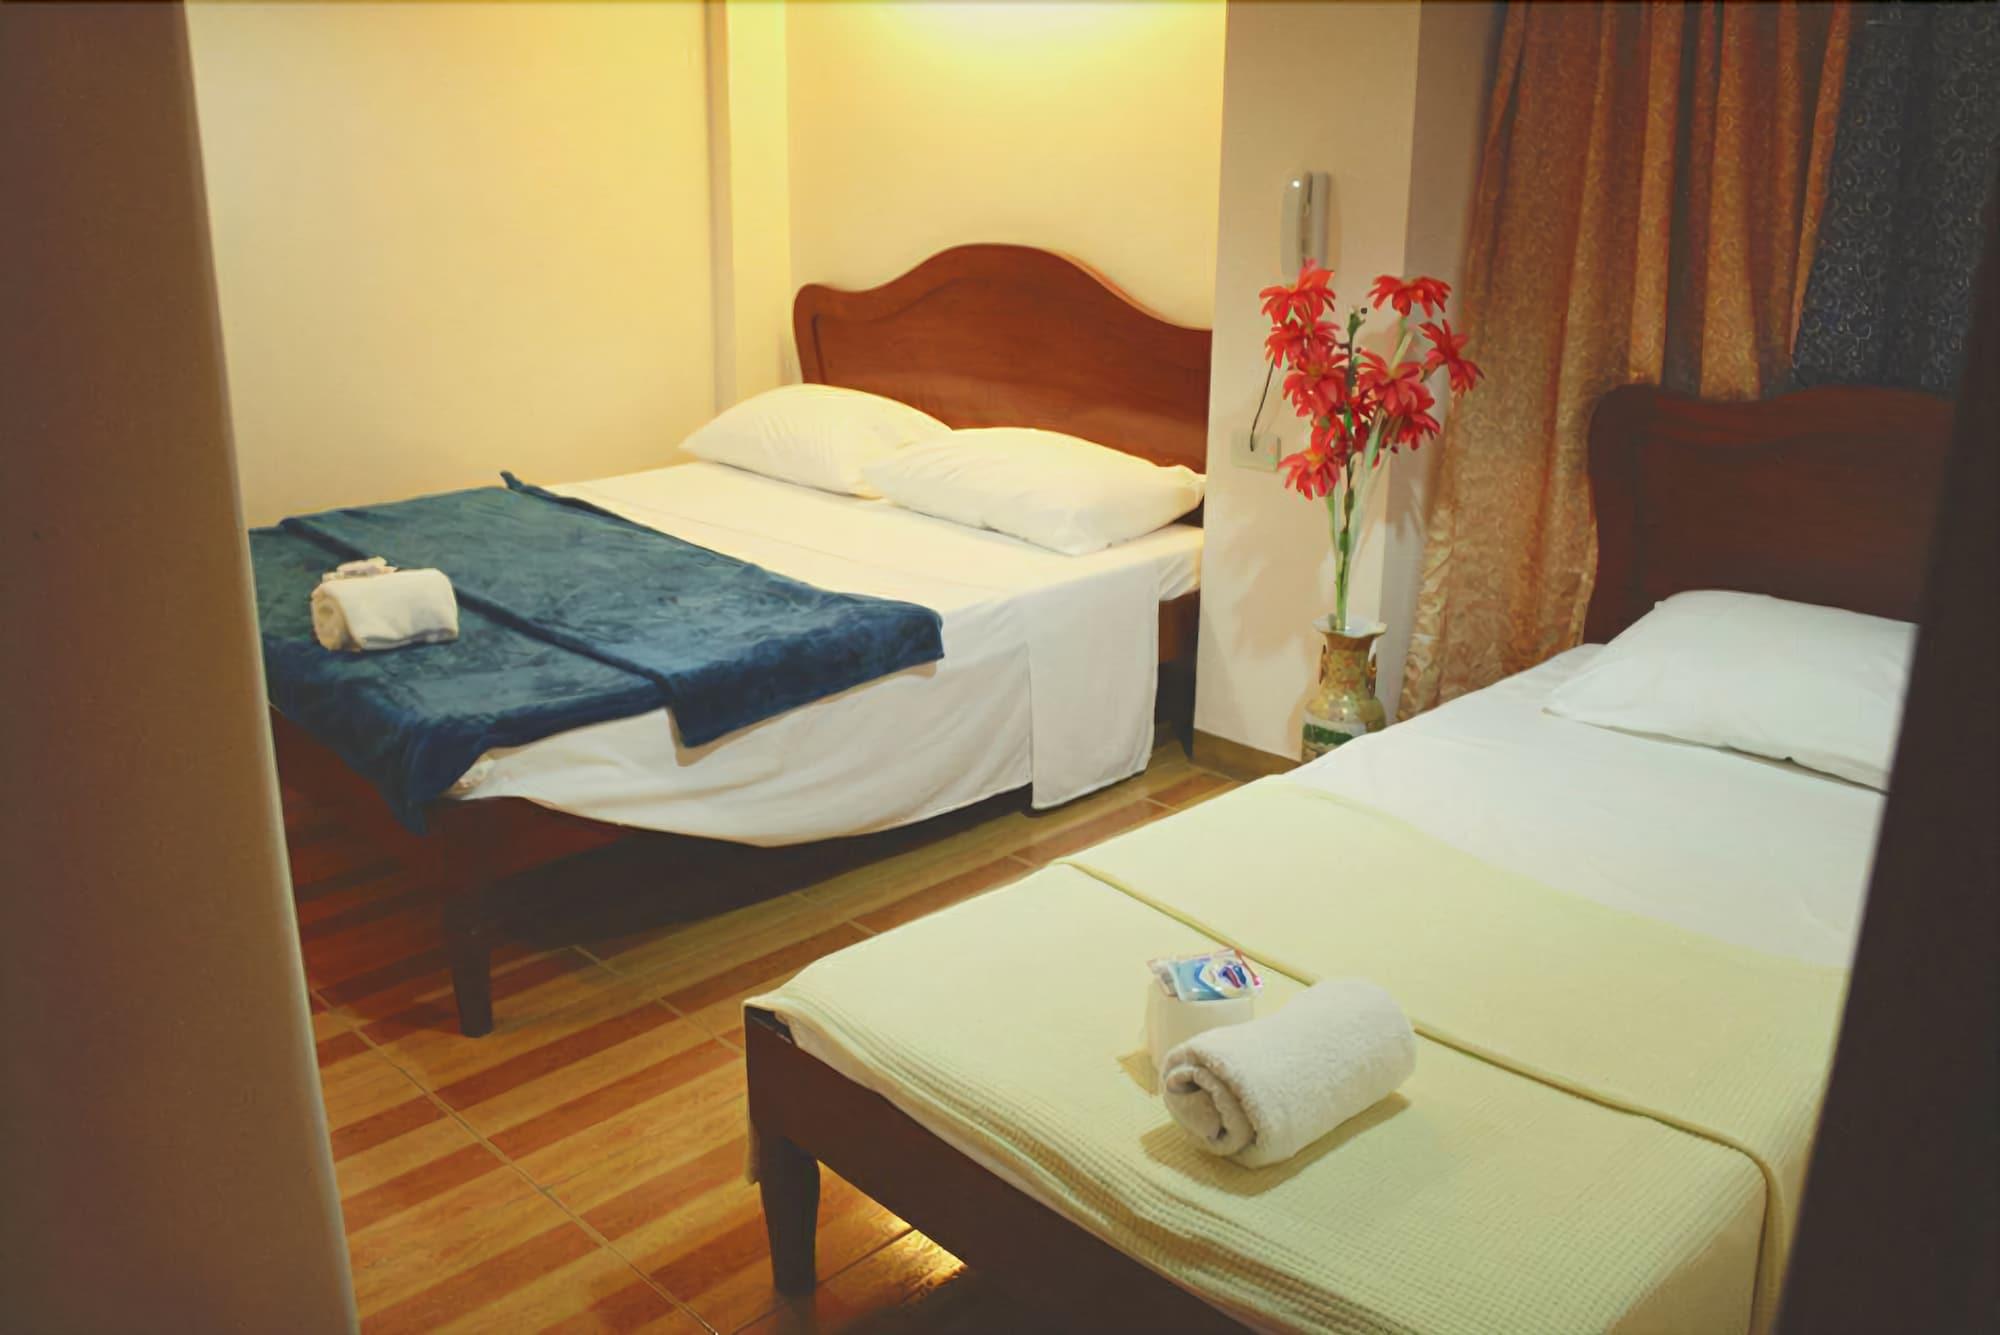 Southpoolside Tourist Inn, Naga City